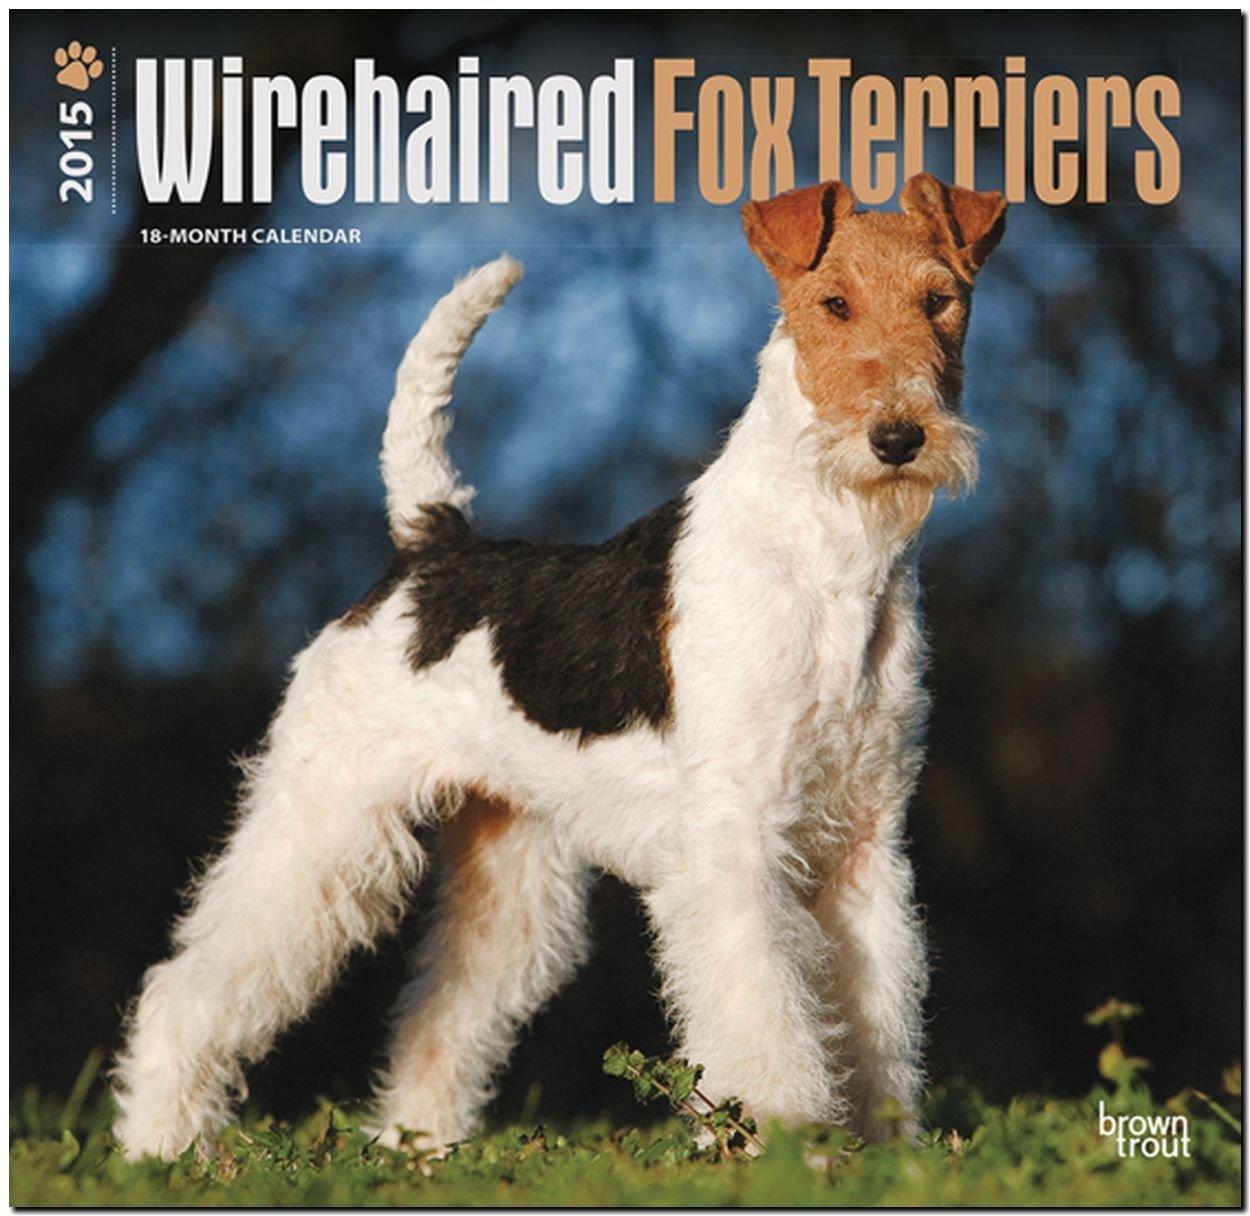 Fox Terriers 2015 - Foxterrier